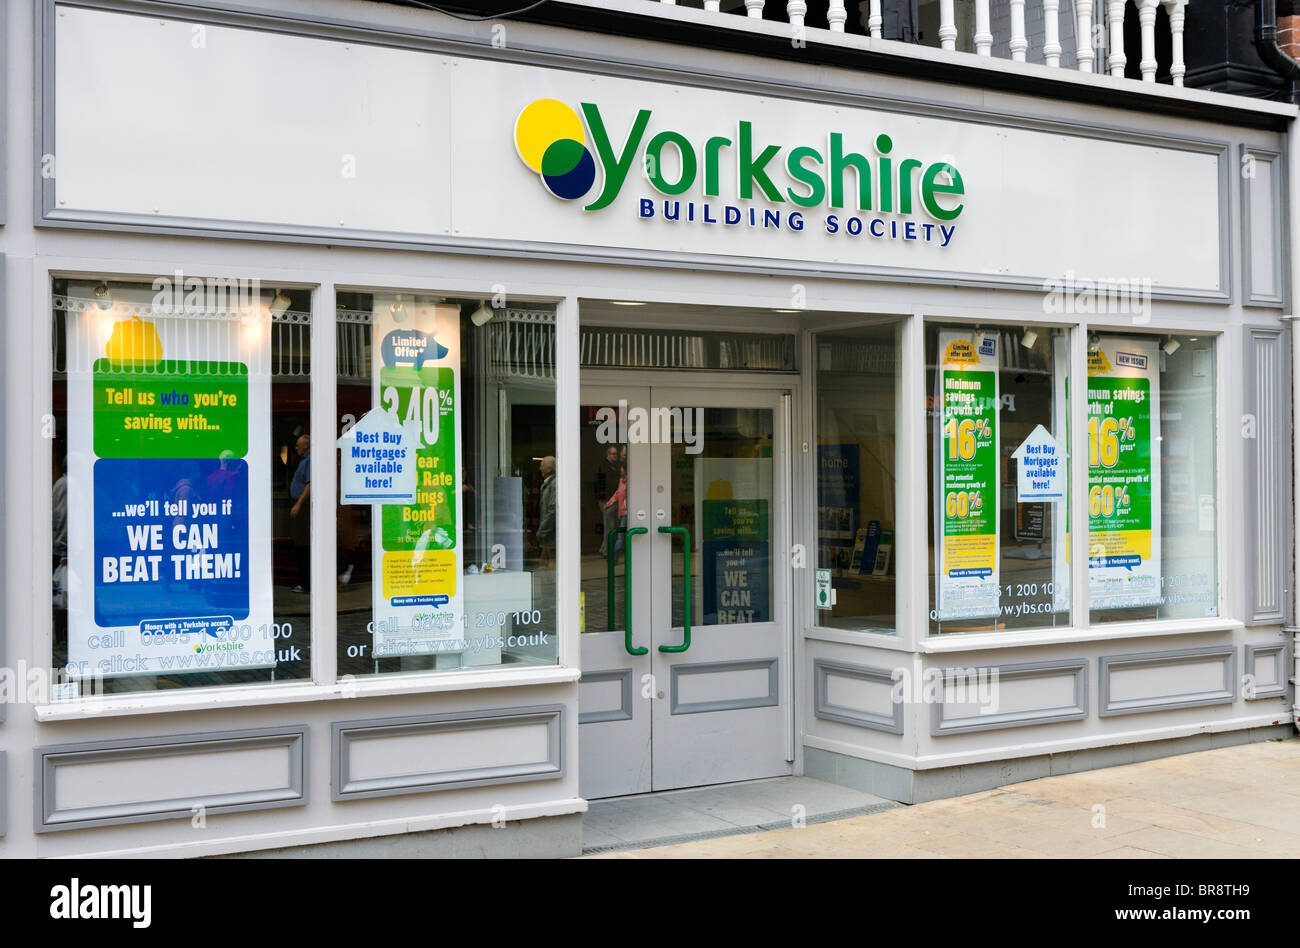 Yorkshire Building Society Niederlassung in Chester Stadtzentrum, Cheshire, England, UK Stockbild